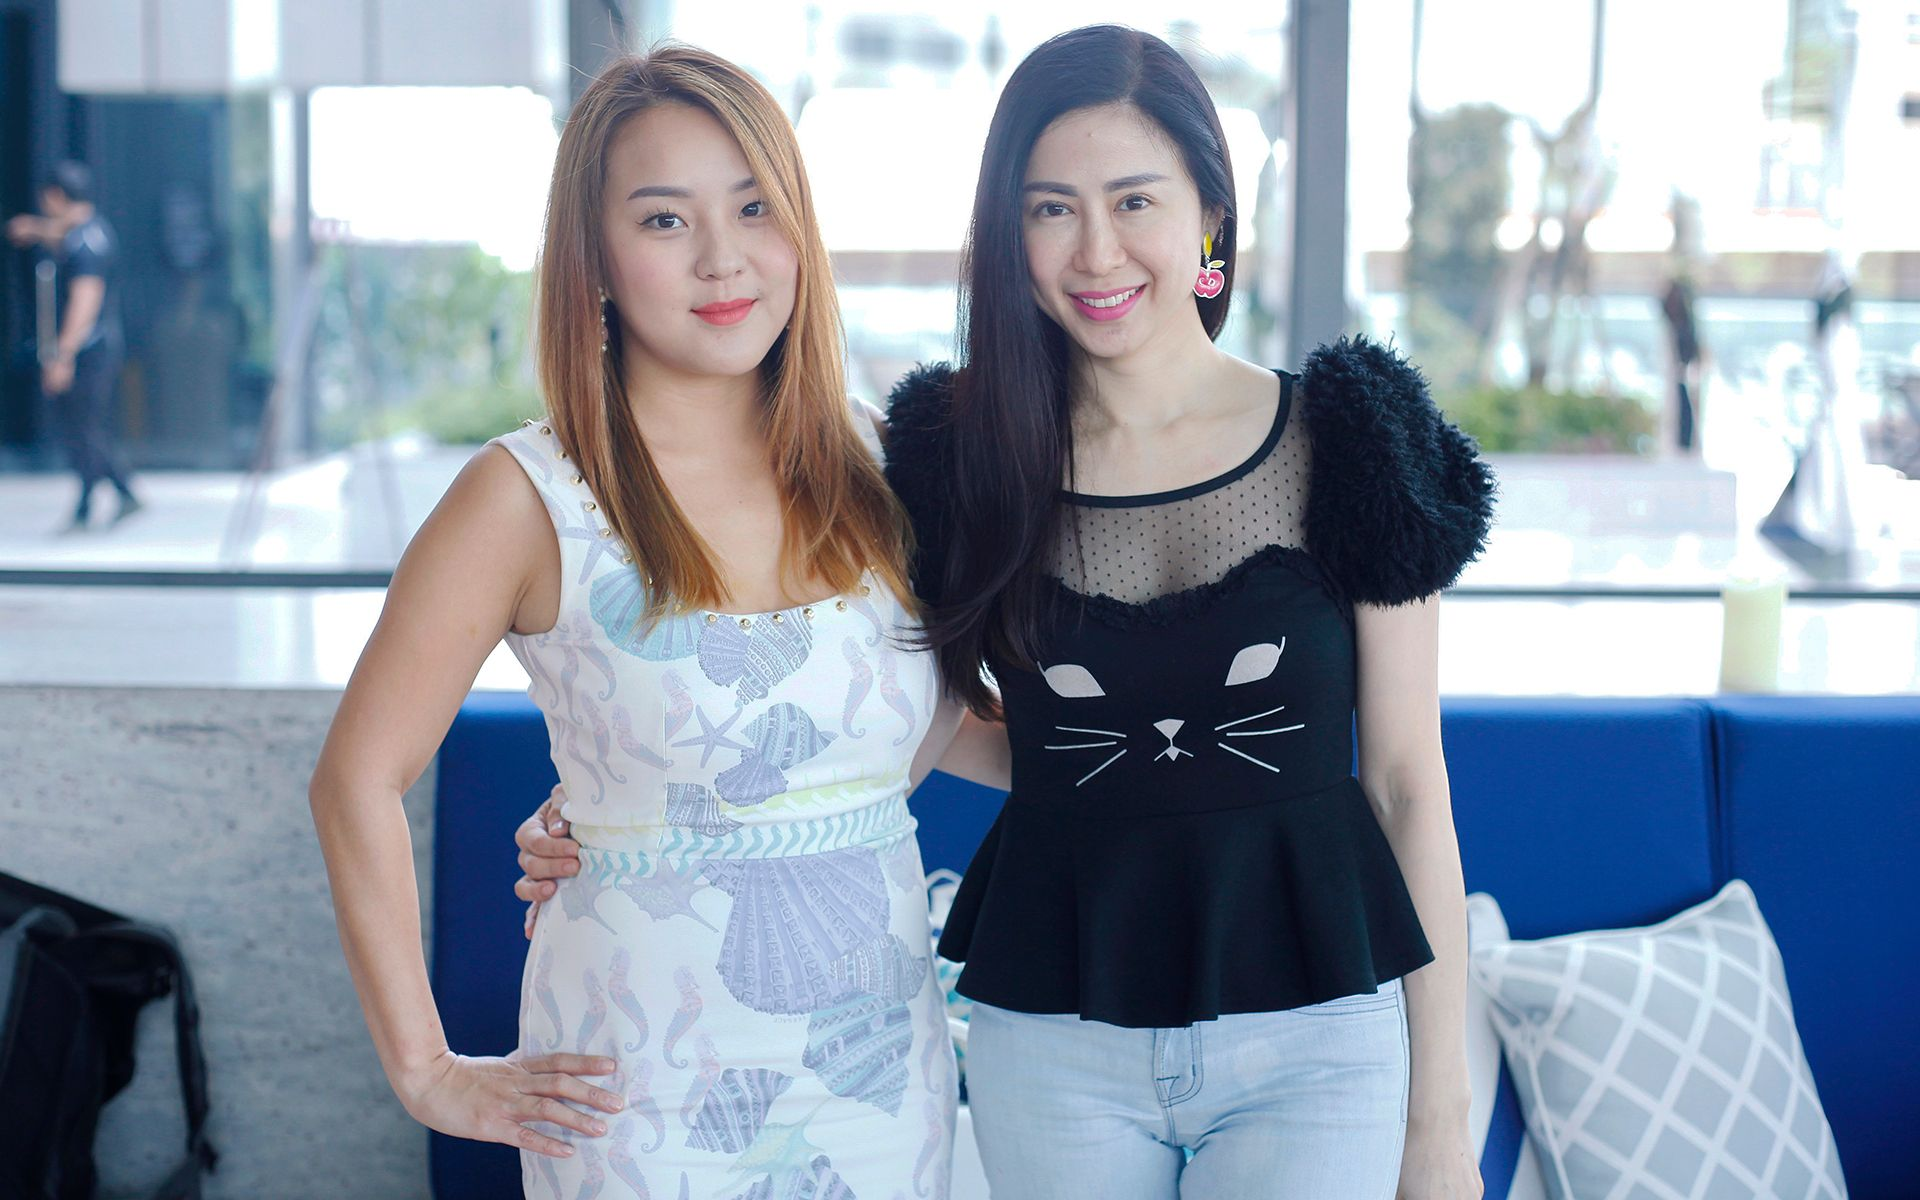 Valerie Ong and Kimisabelle Choo